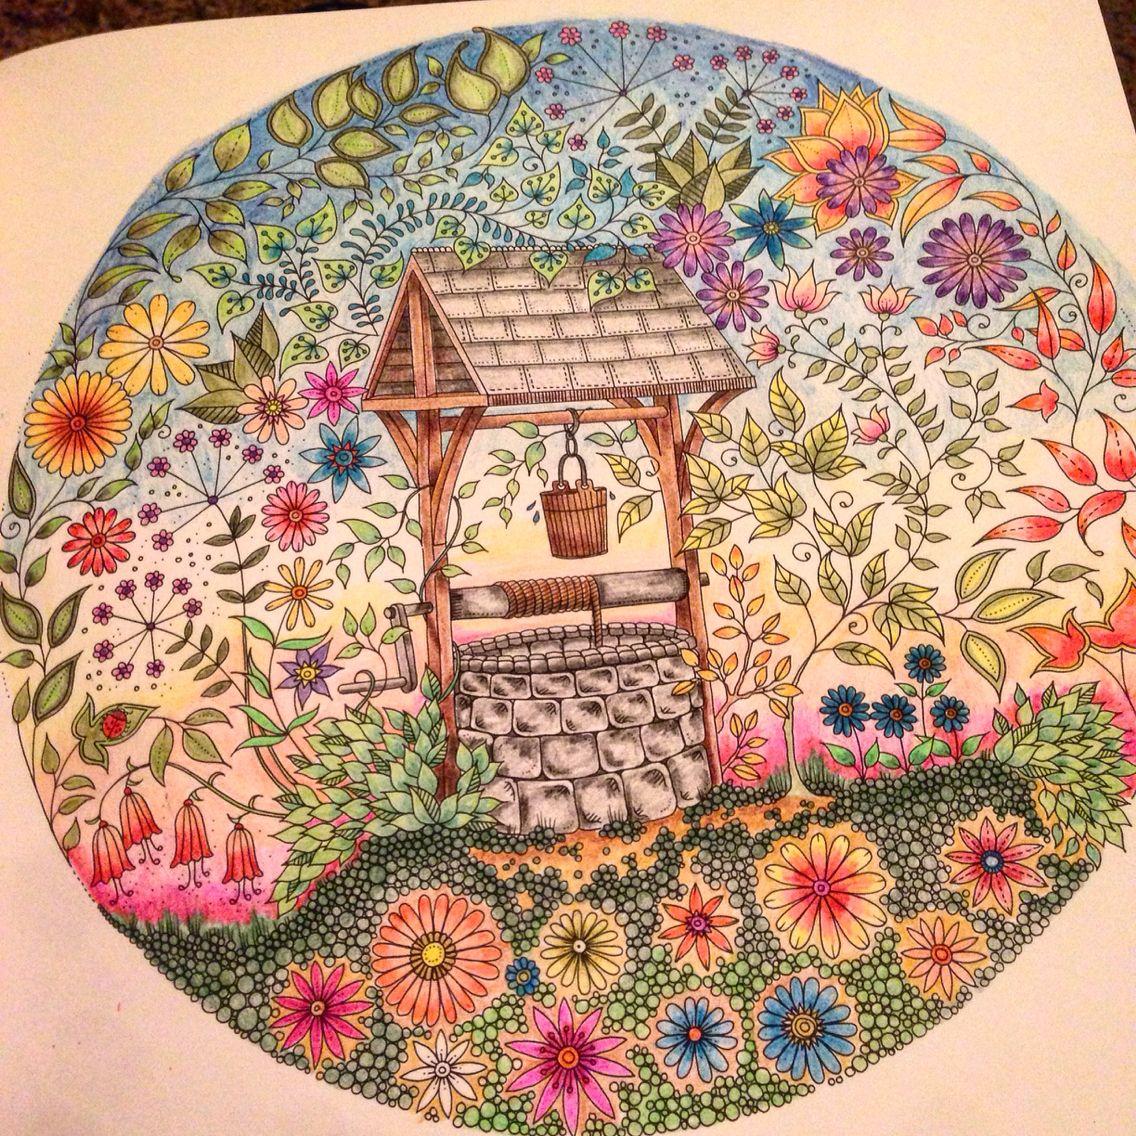 Secret Garden Colouring Book The Well Secret Garden Coloring Book Secret Garden Colouring Johanna Basford Coloring